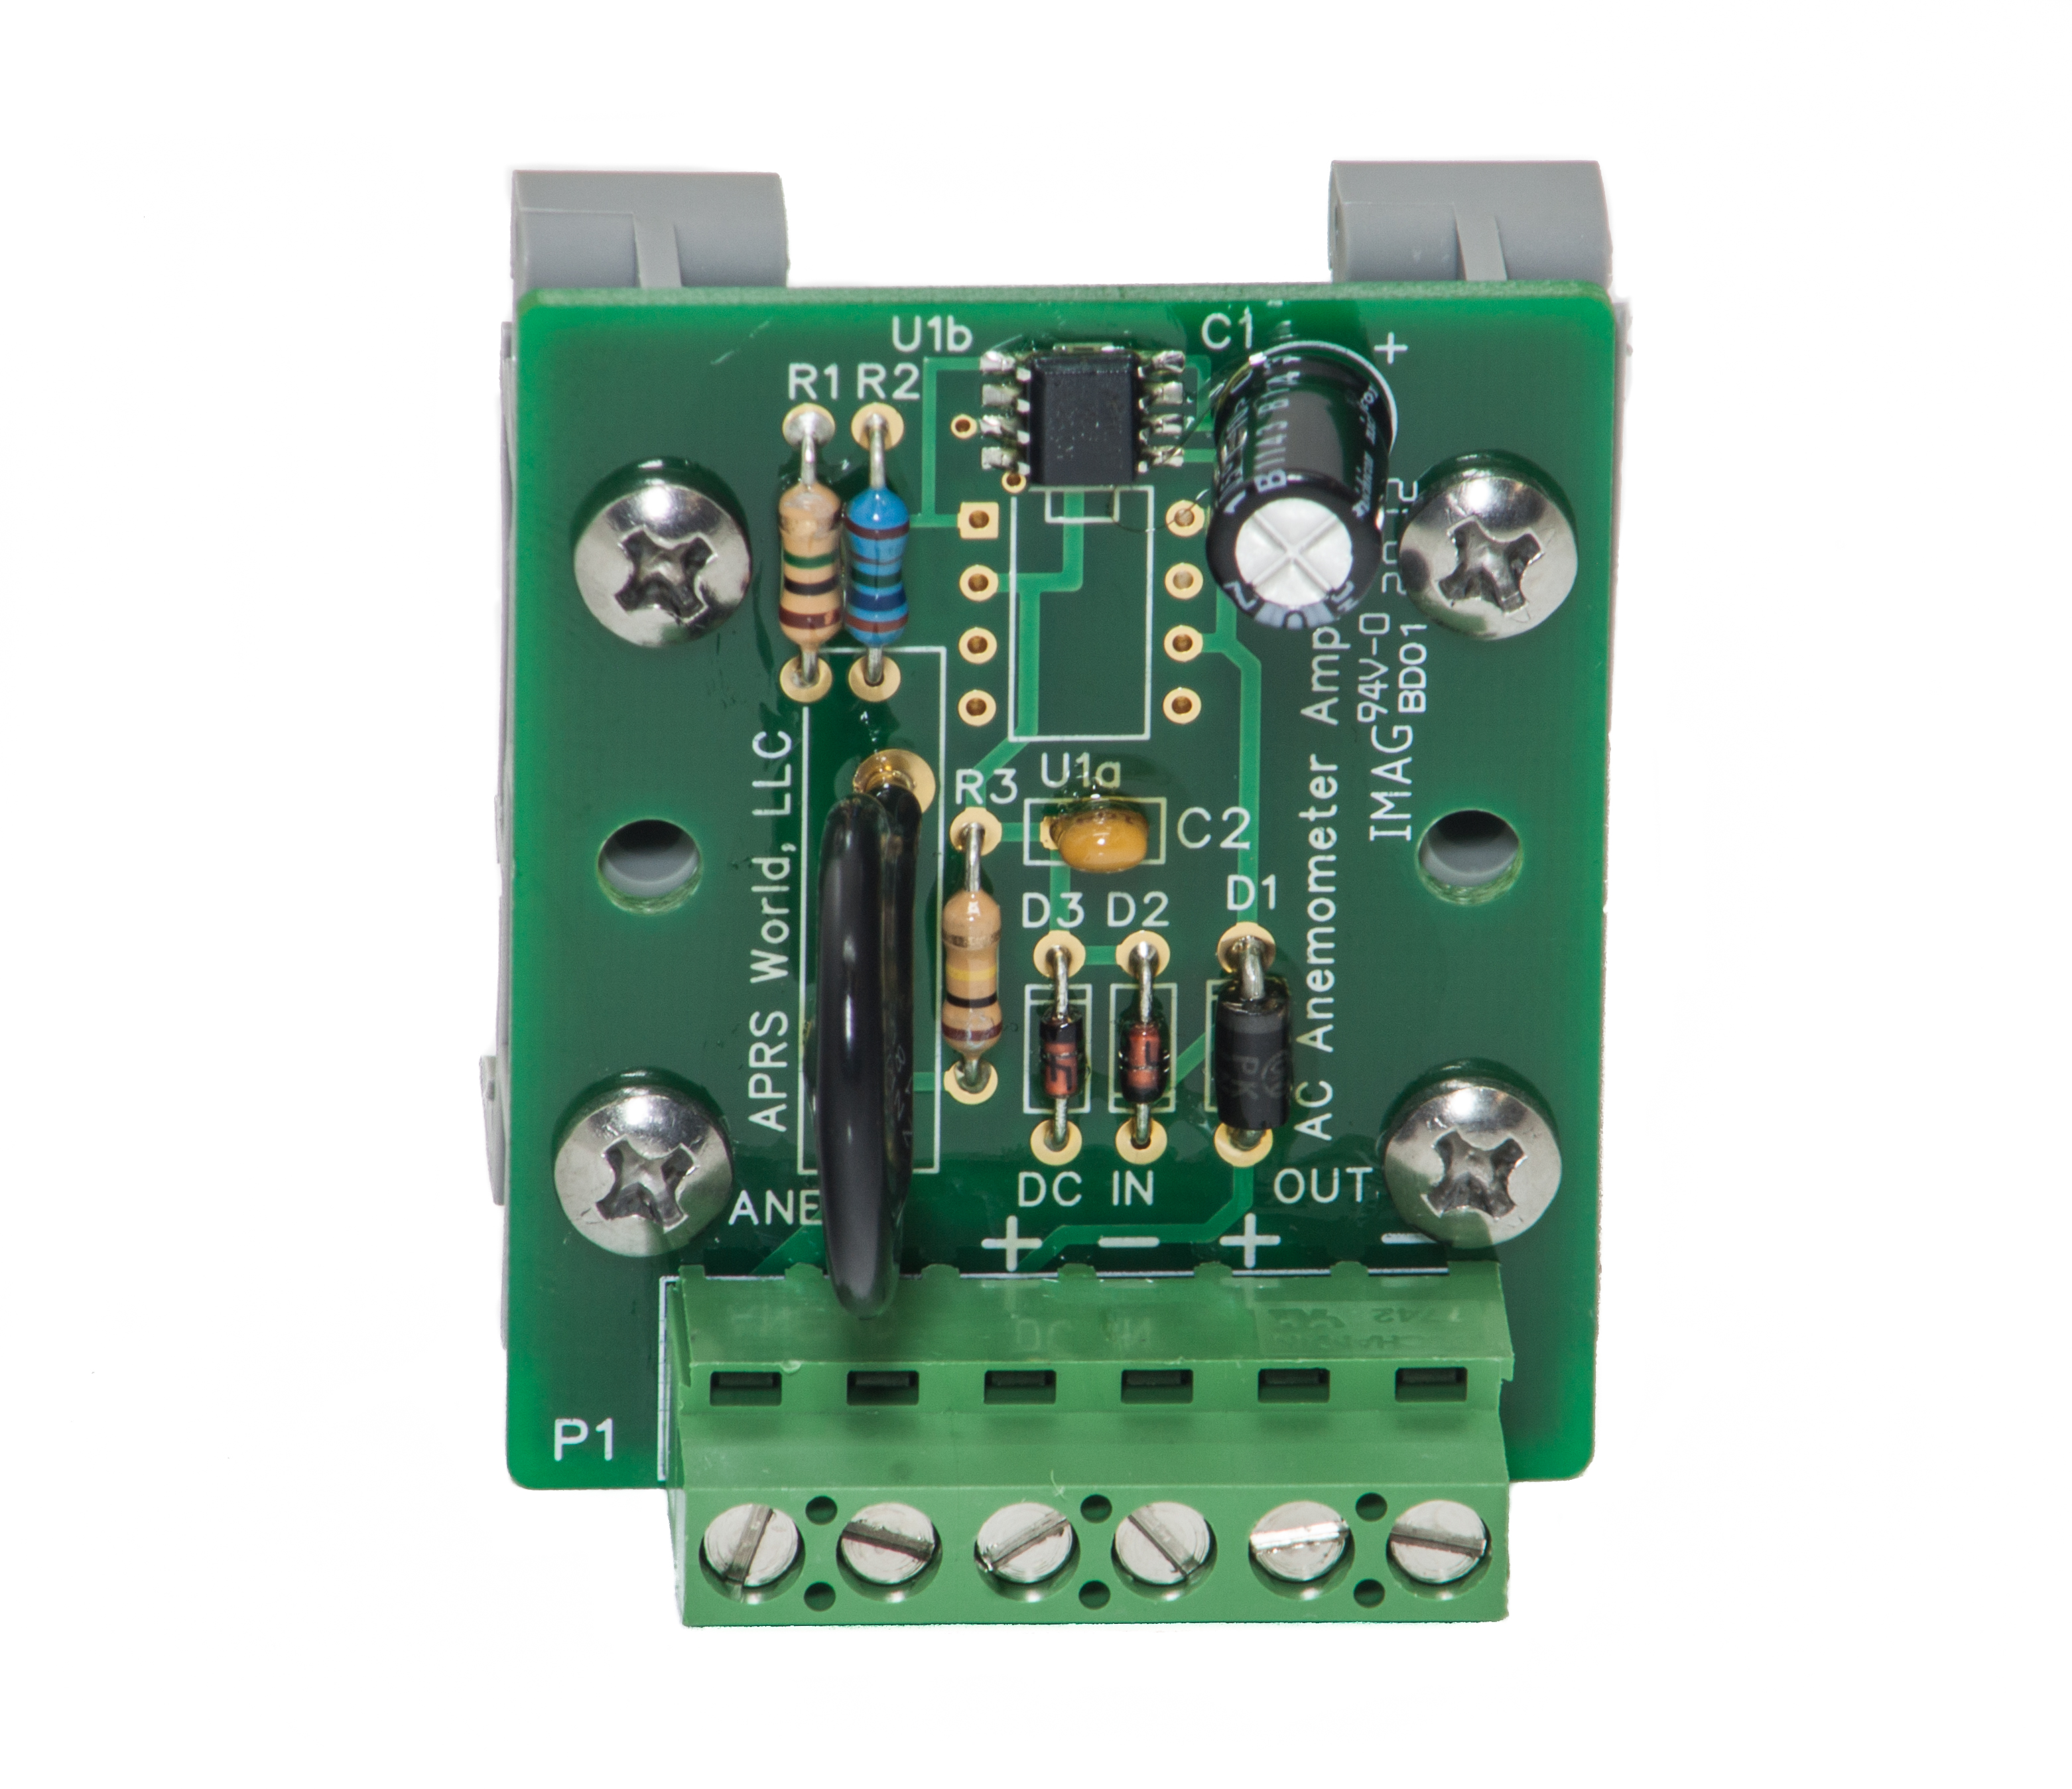 aprs6511 ac anemometer amplifier board view full size view slideshow [ 3124 x 2697 Pixel ]